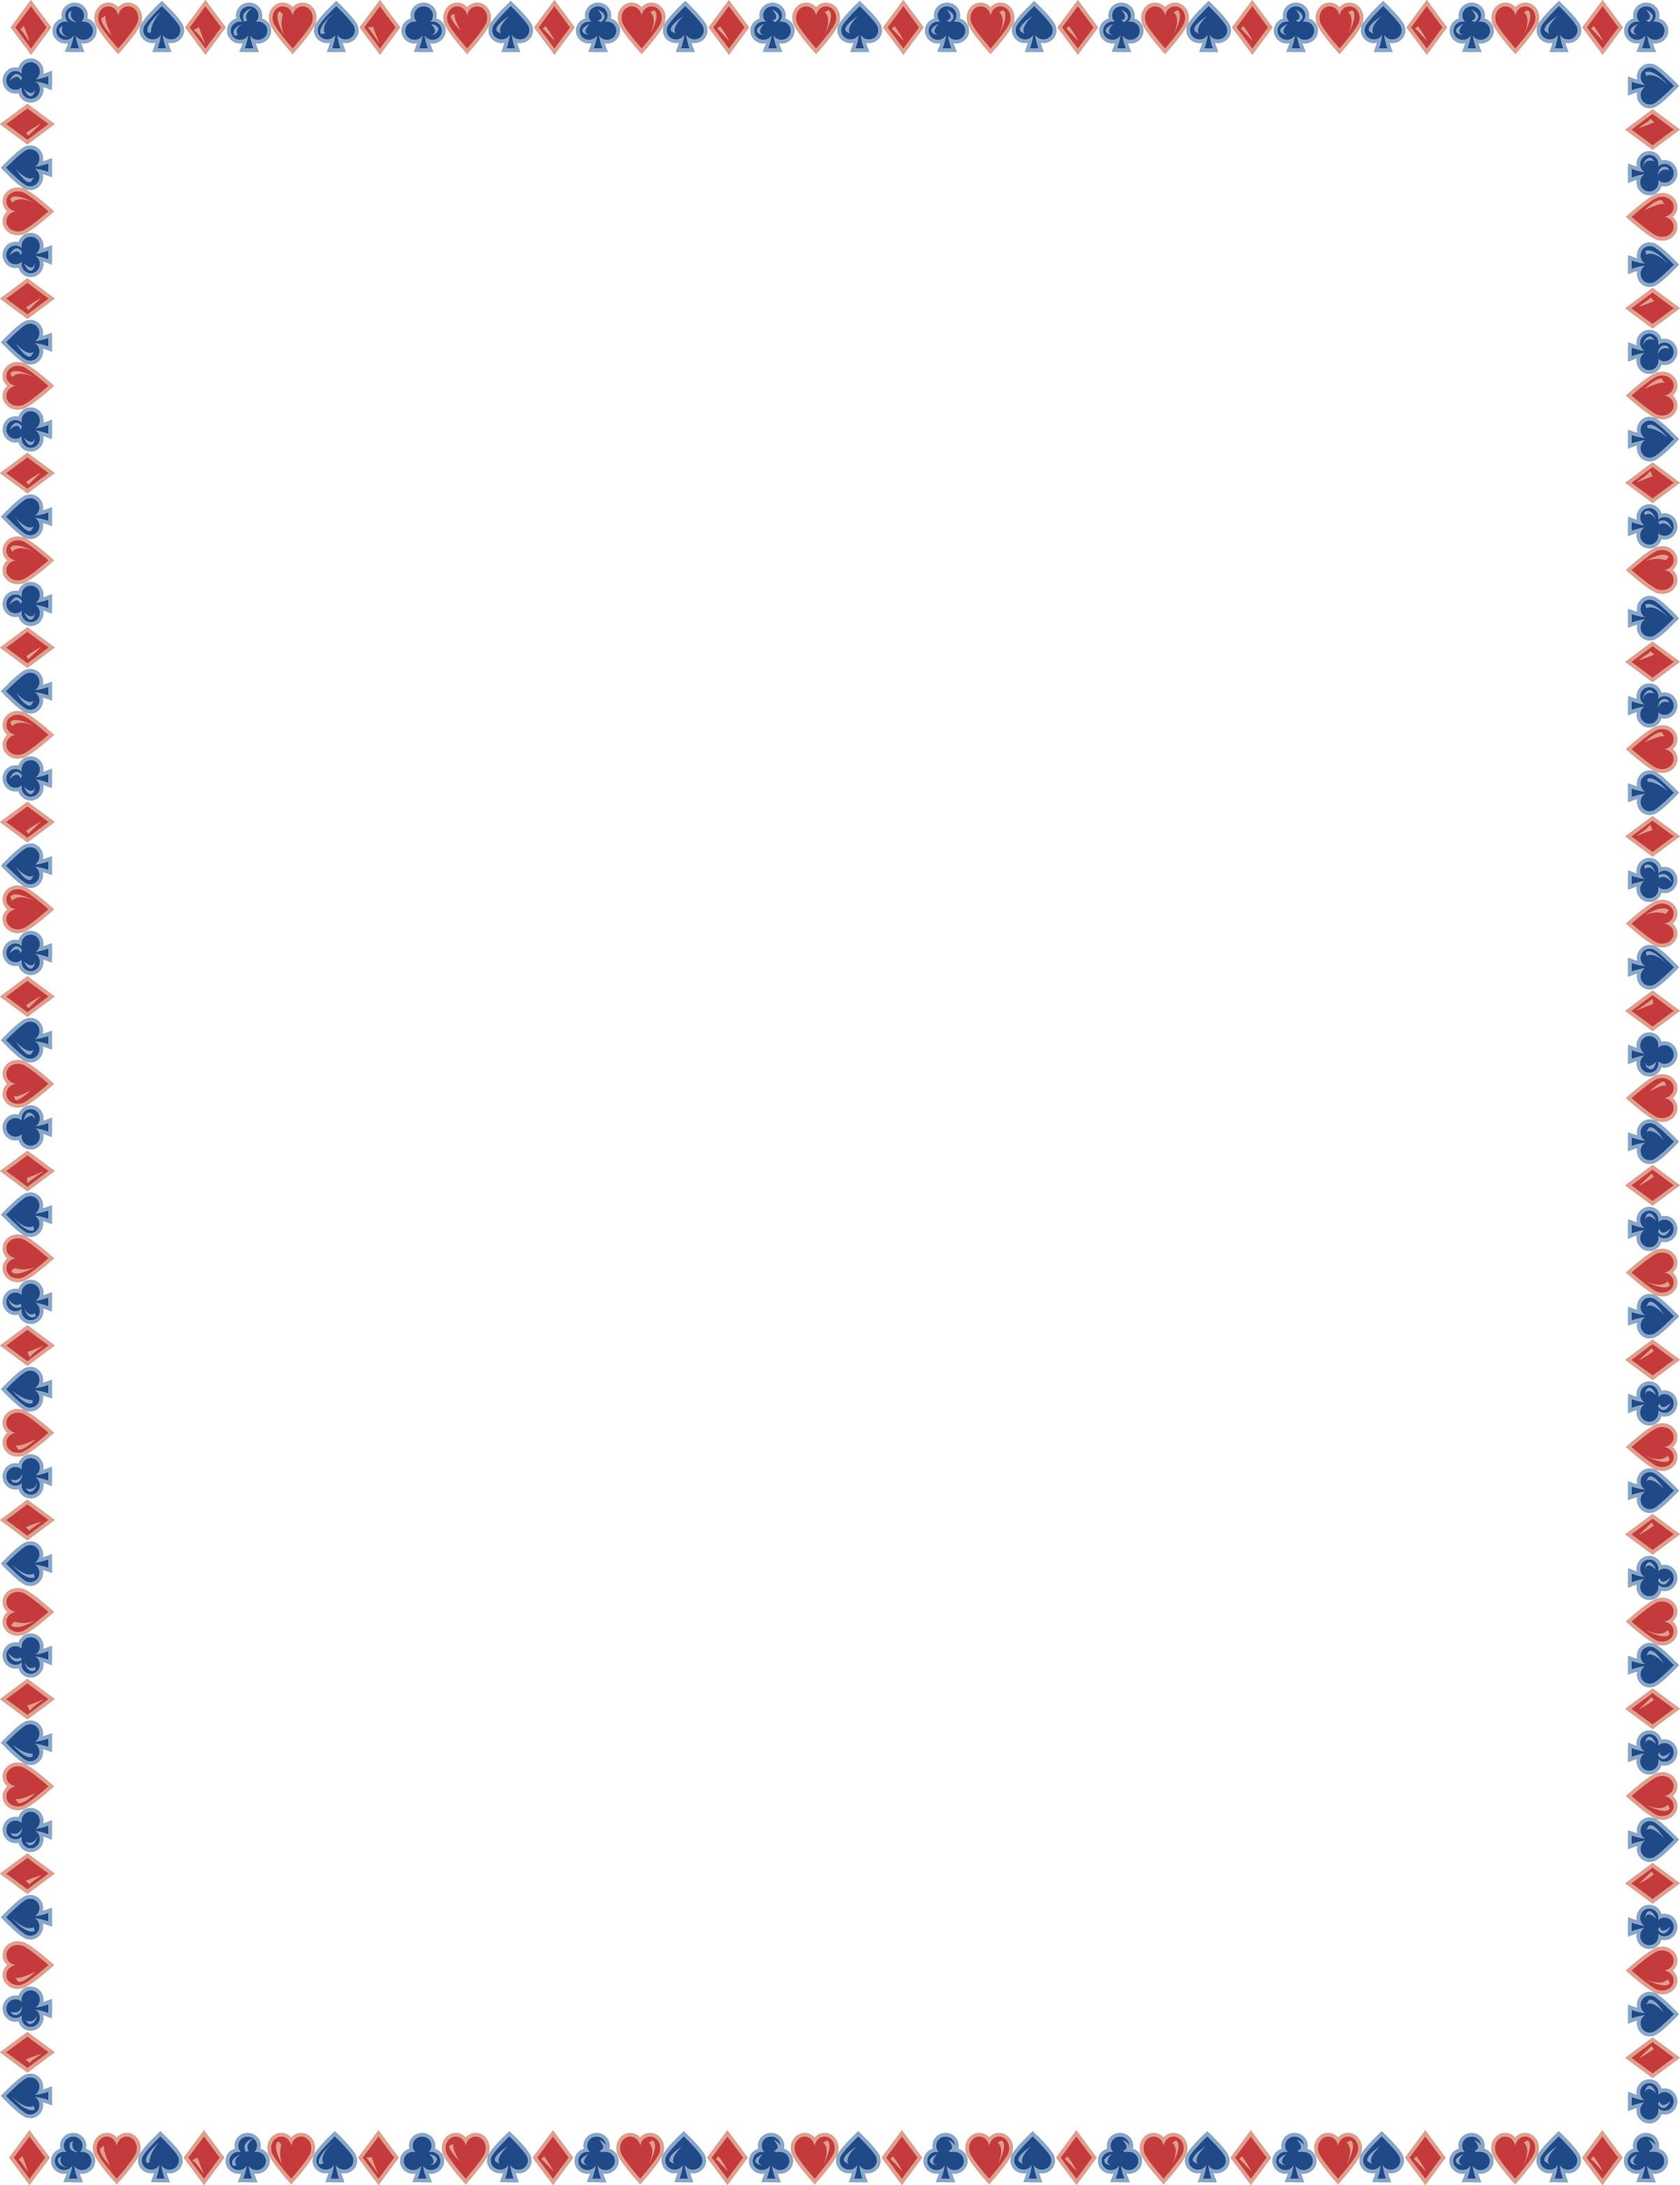 Premium Paper Stock FREE Customizable Envelopes Starting At $ For 25 Cards {{productAttributes[attributeKey].attributeName}}.